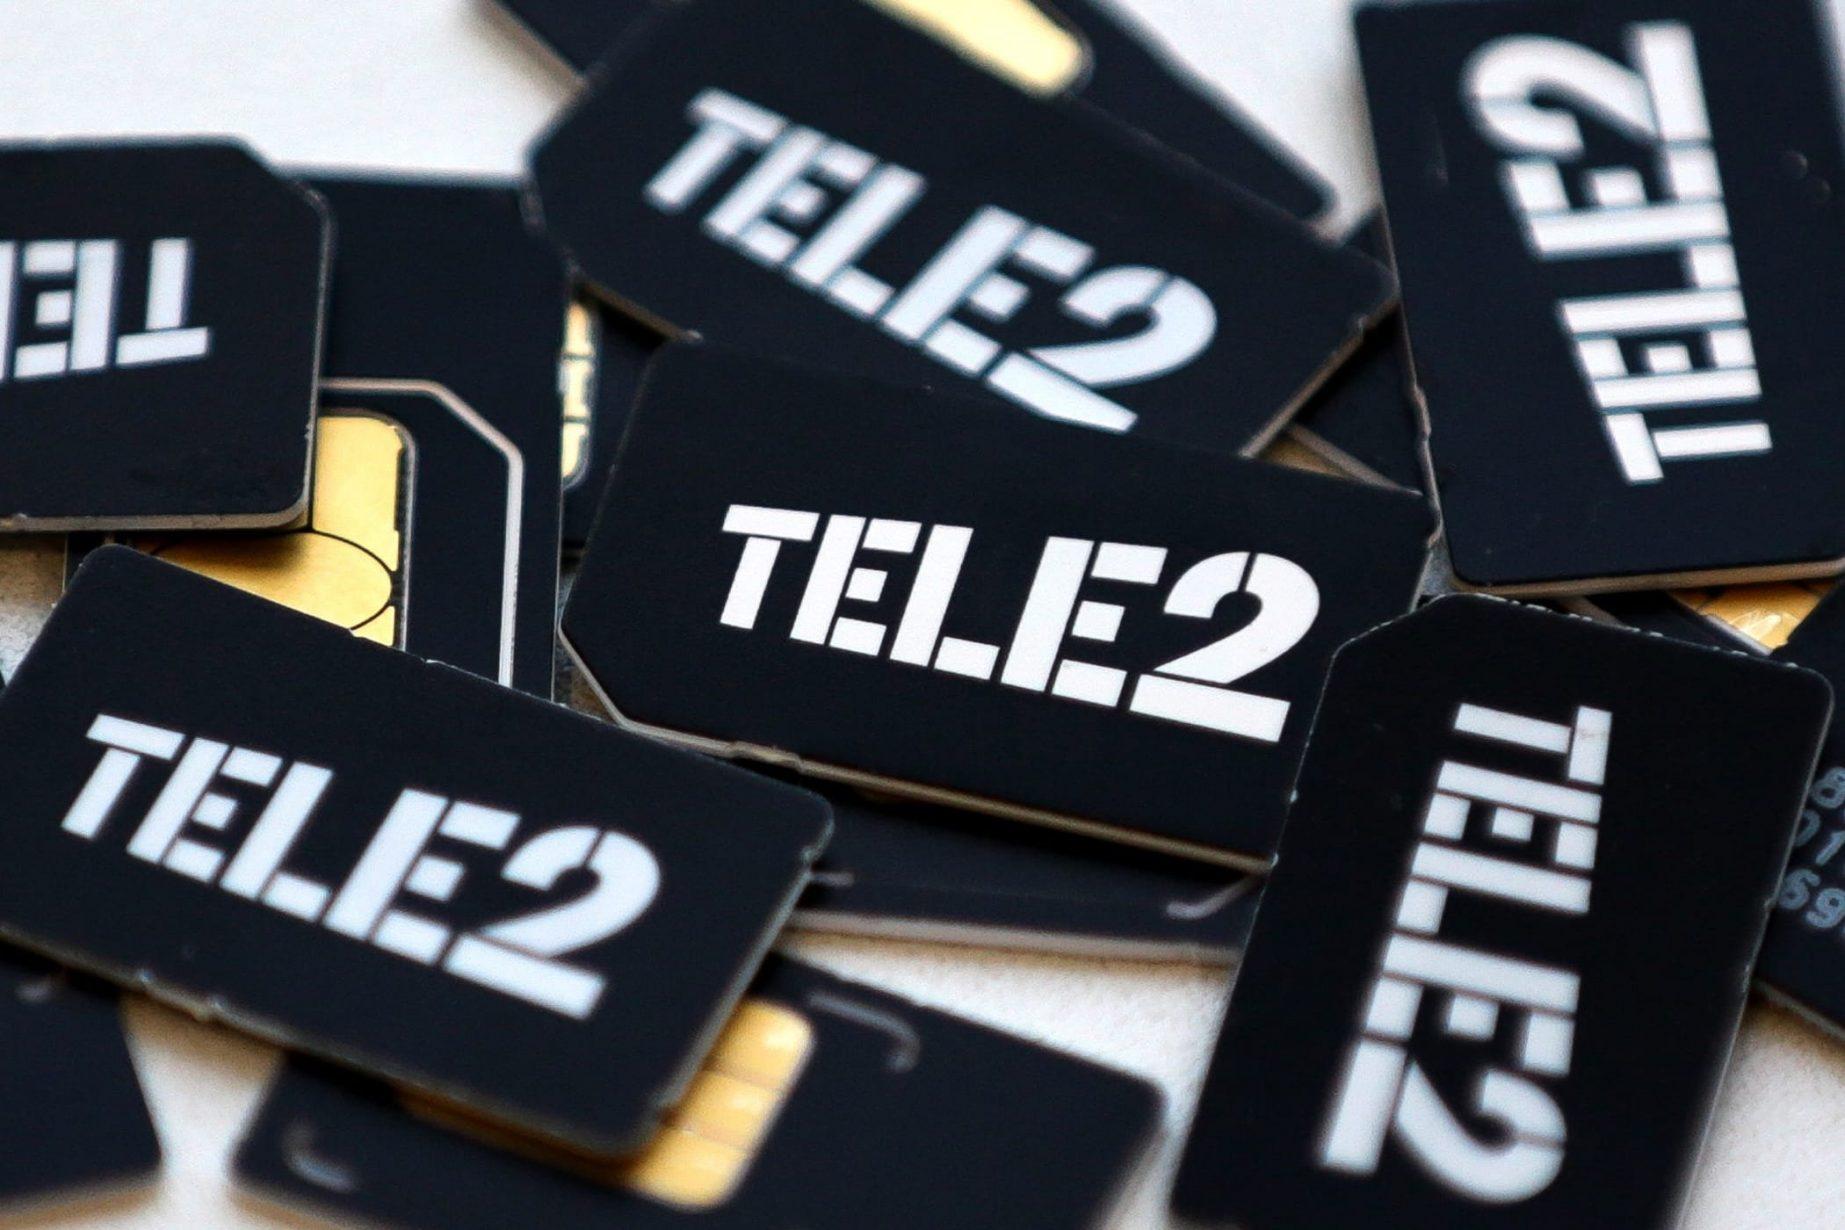 1532790753_tele2-tarif-mechty-tele2